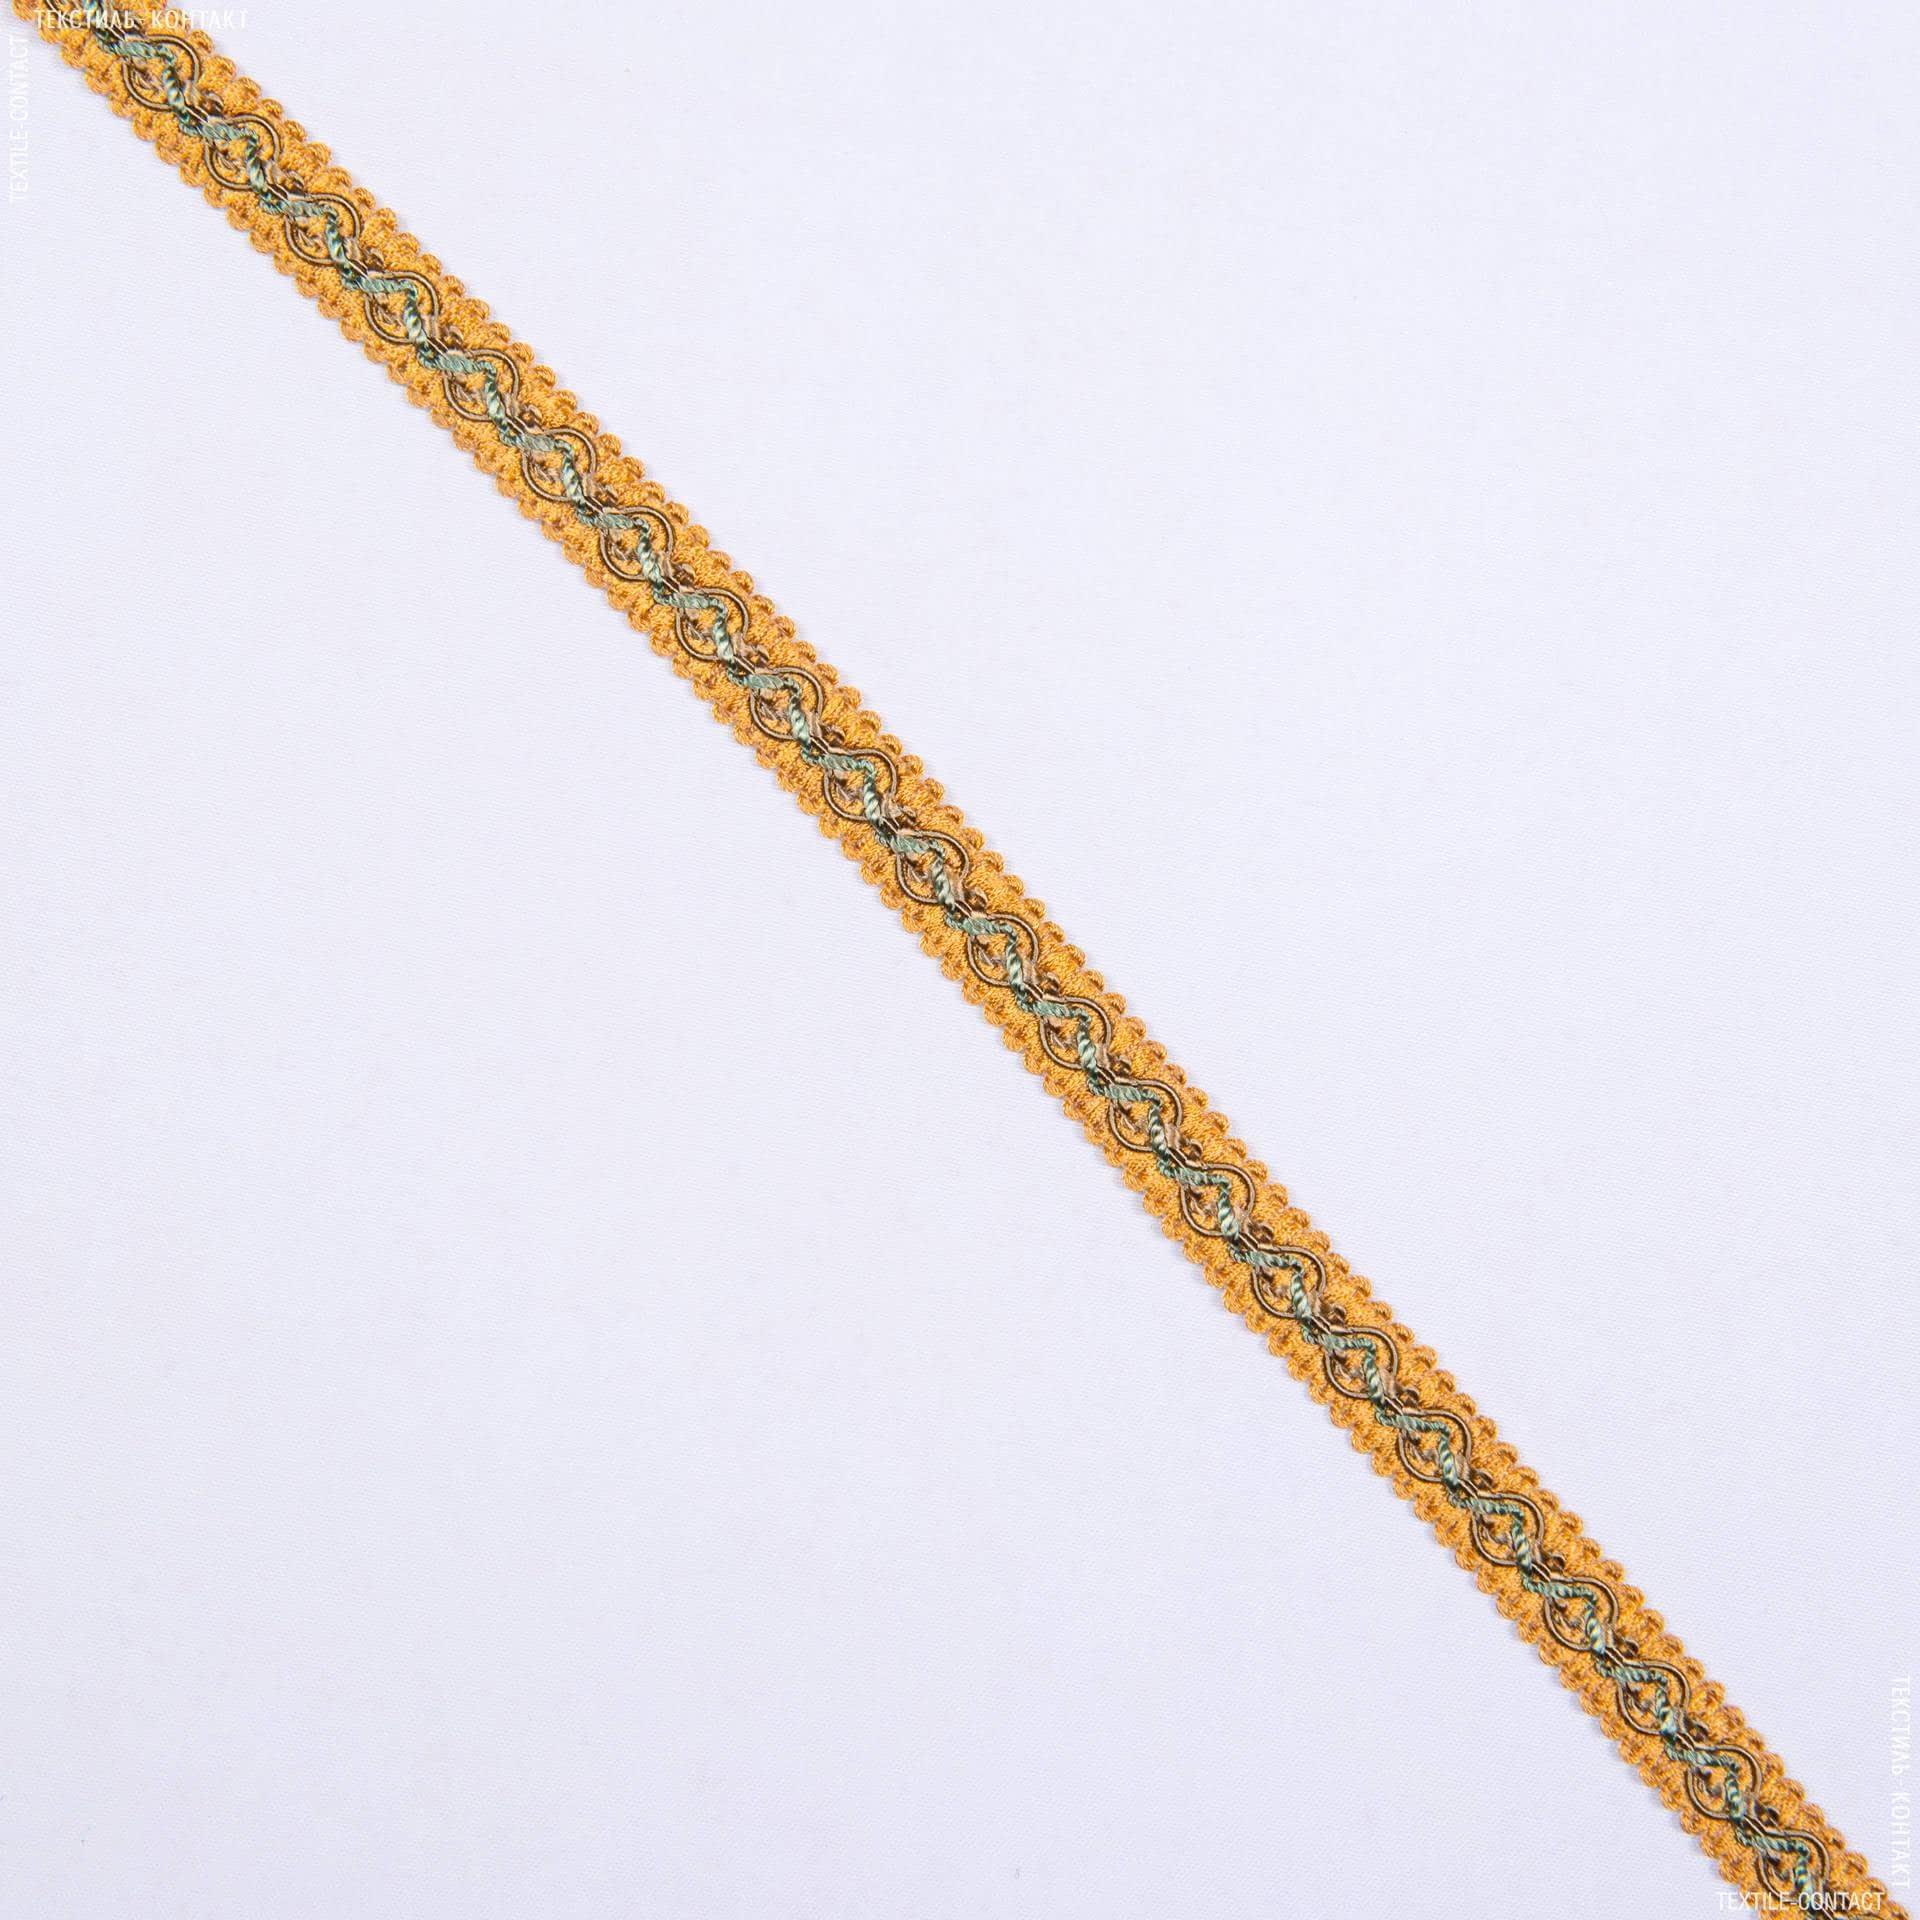 Ткани фурнитура для декора - Тесьма окантов. Имедженейшен, оливка-золото